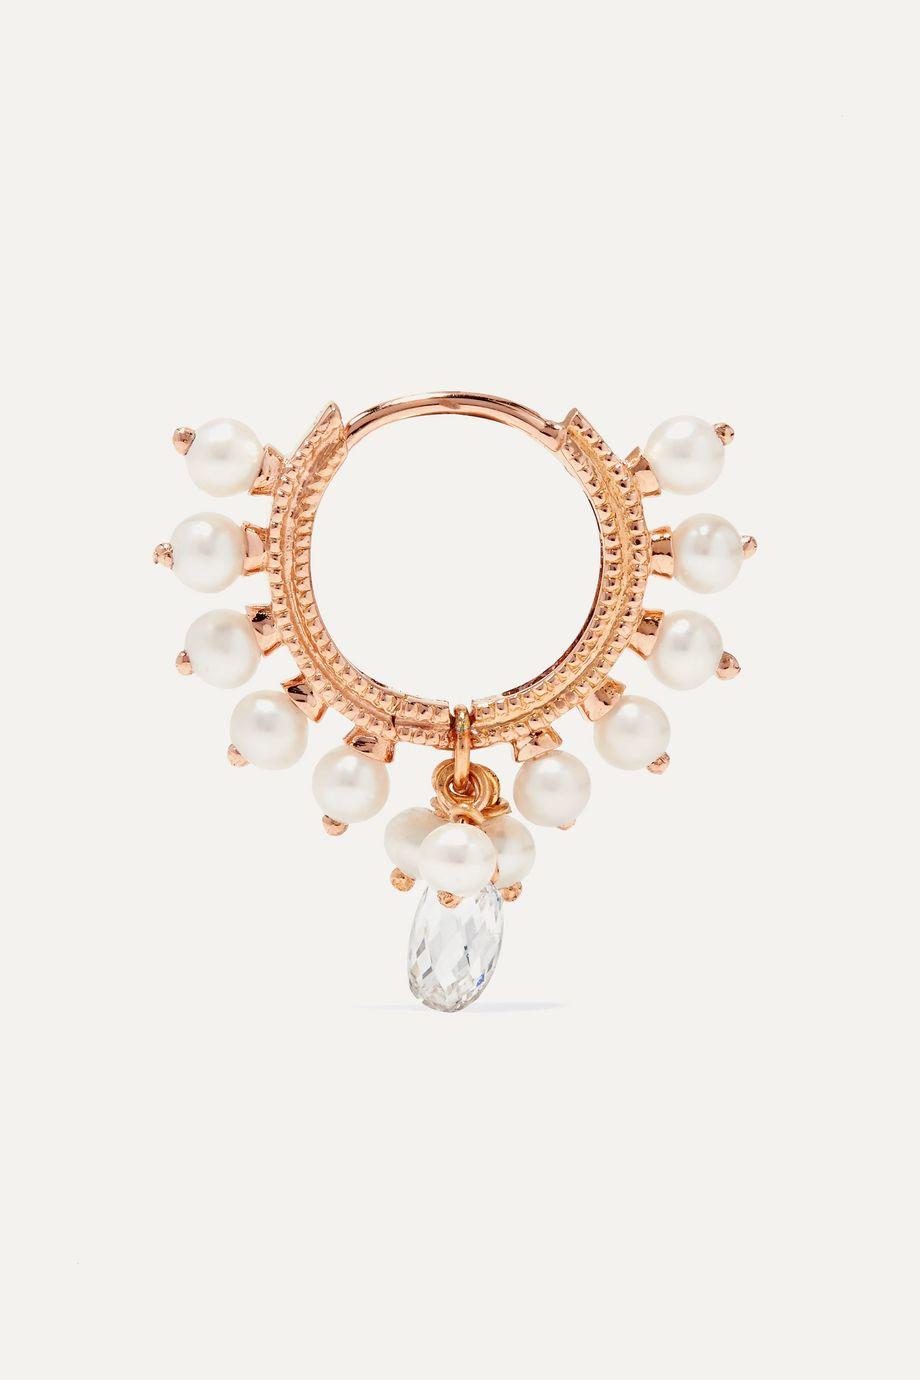 Maria Tash 8mm 14-karat rose gold, pearl and diamond hoop earring